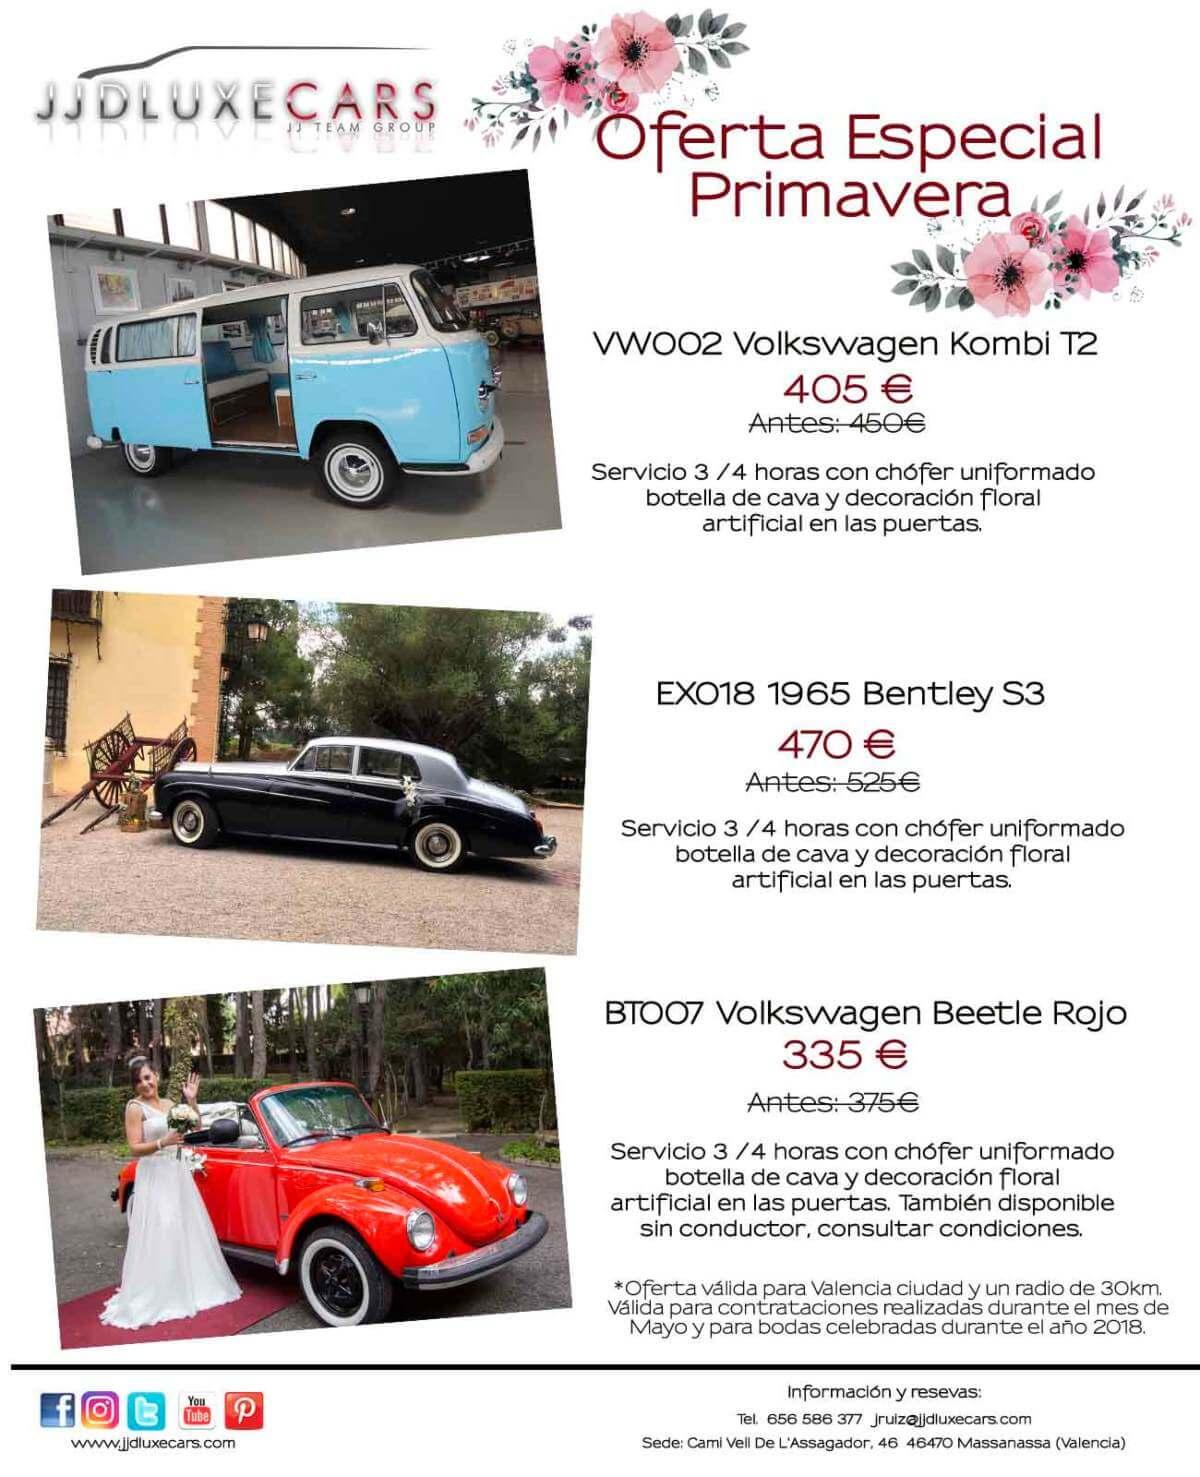 alquiler coches clasicos bodas eventos rodajes valencia oferta primavera jjdluxe cars p1